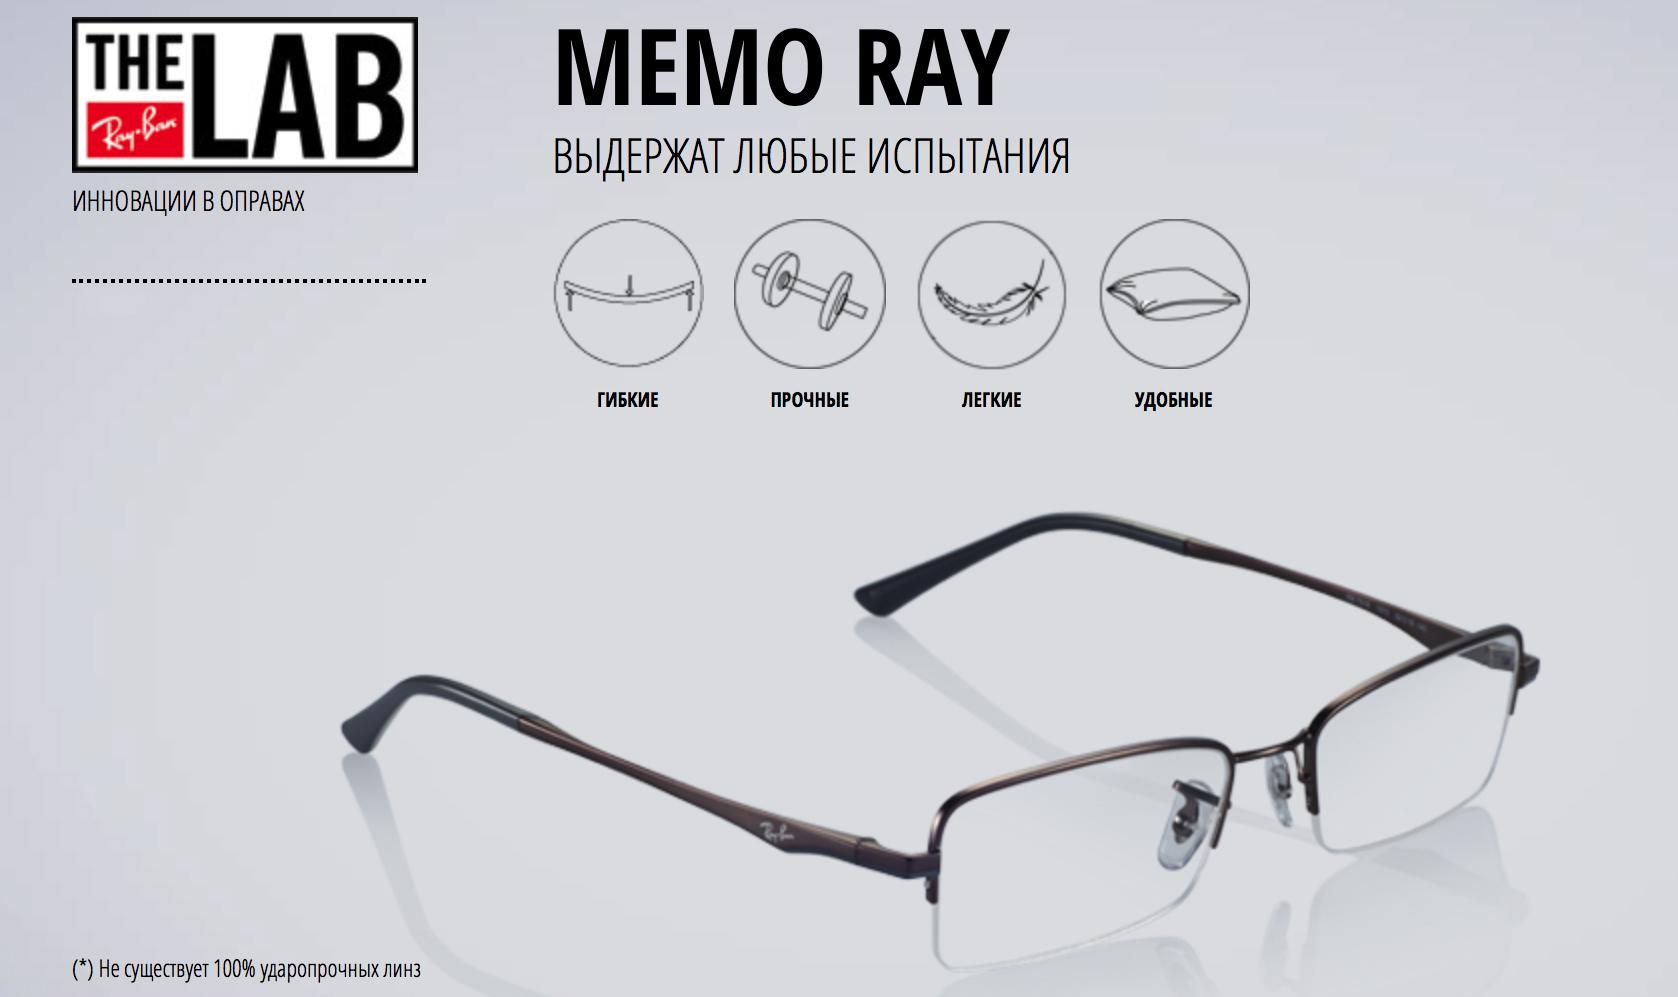 Memo Ray